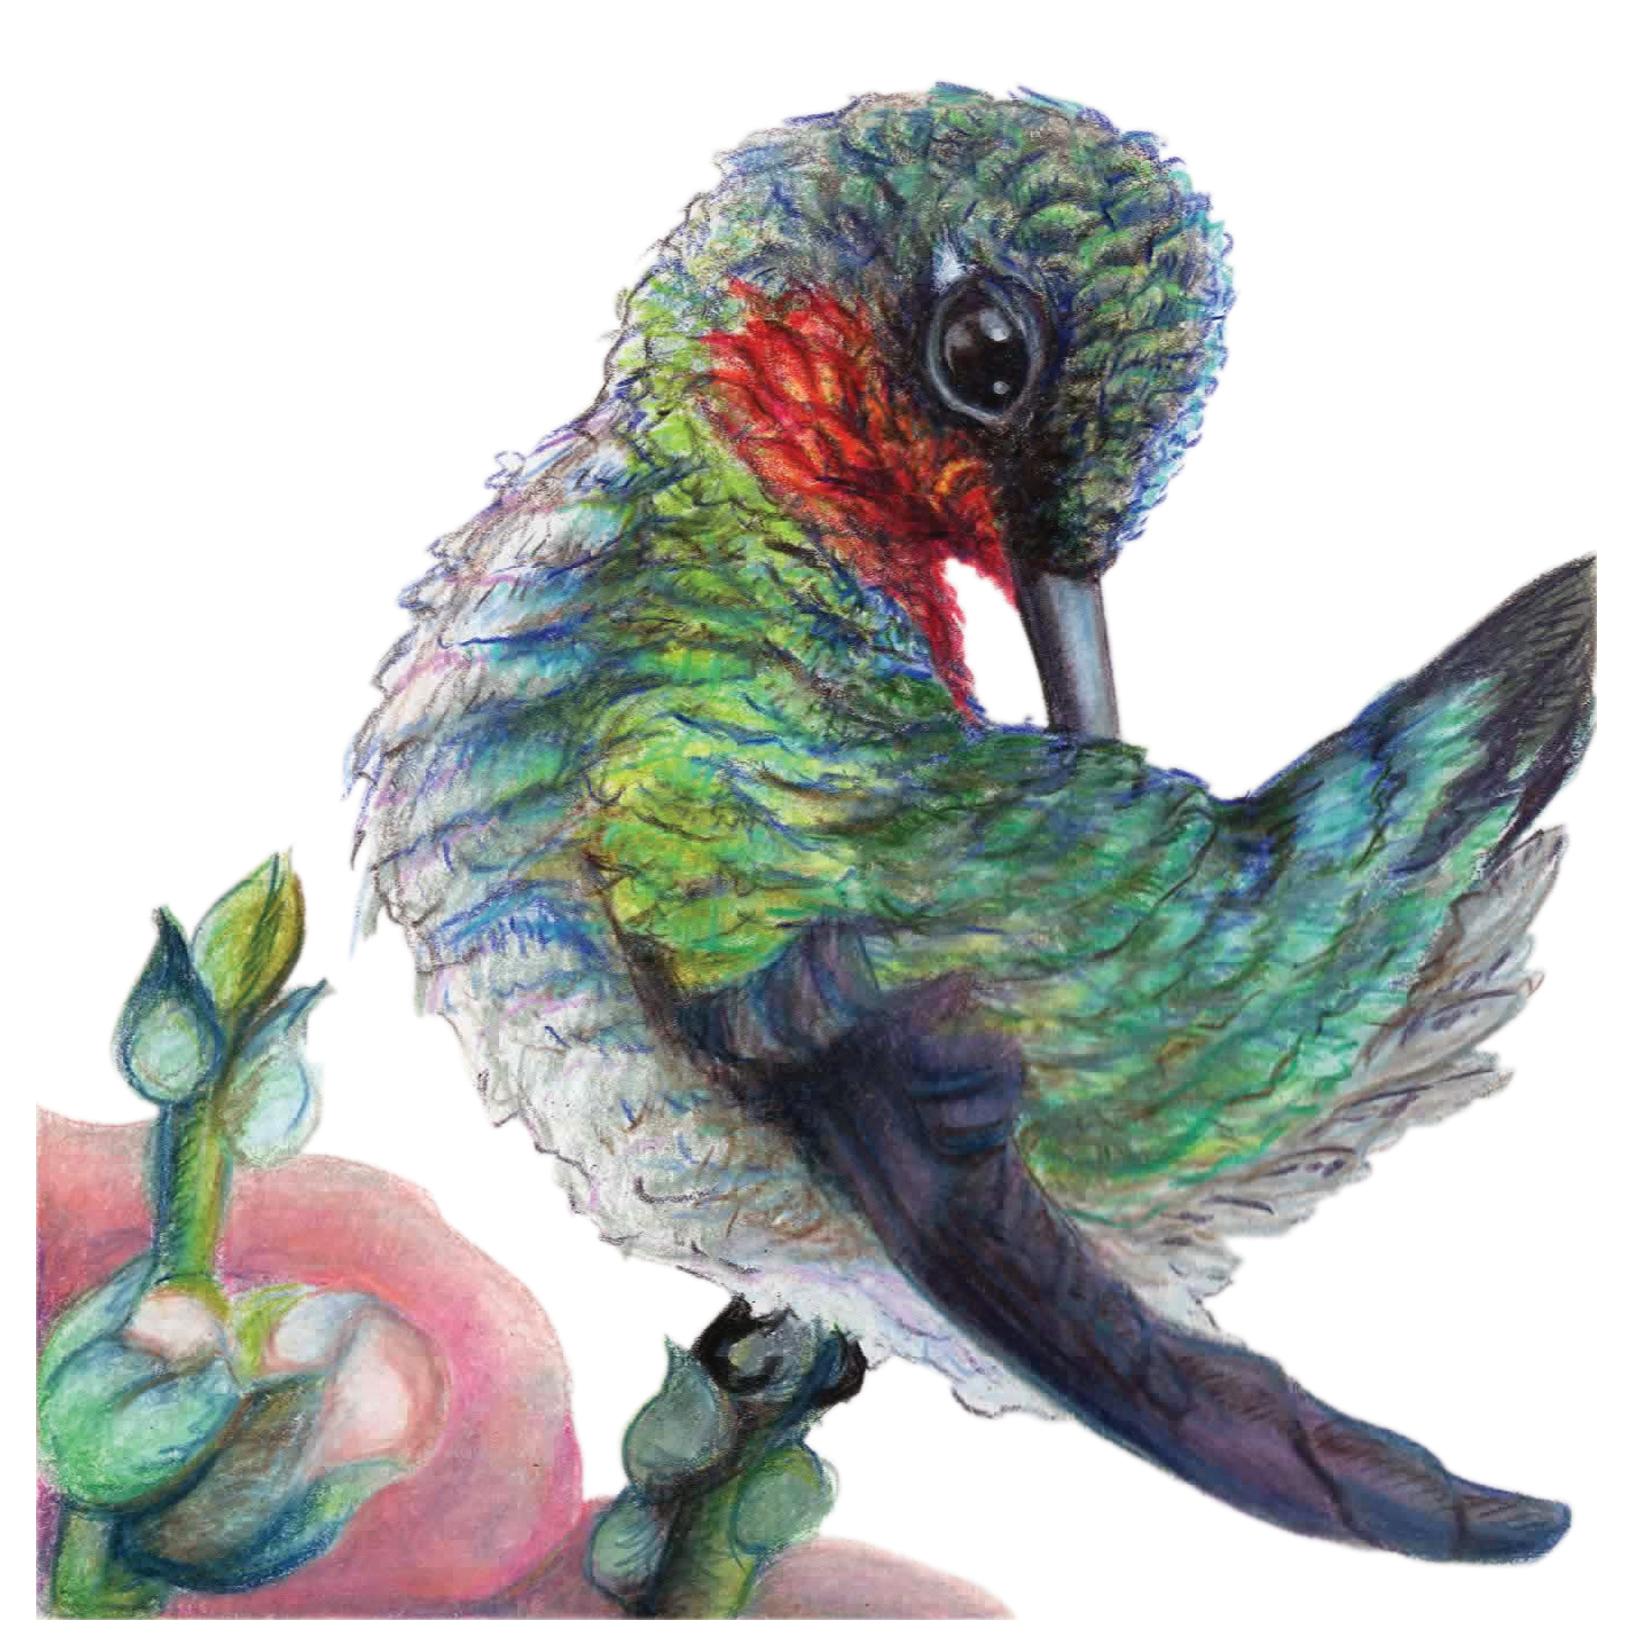 """The Right Spot"", Ruby Throat Hummingbird Original Prismacolor Artwork by Allison Richter"